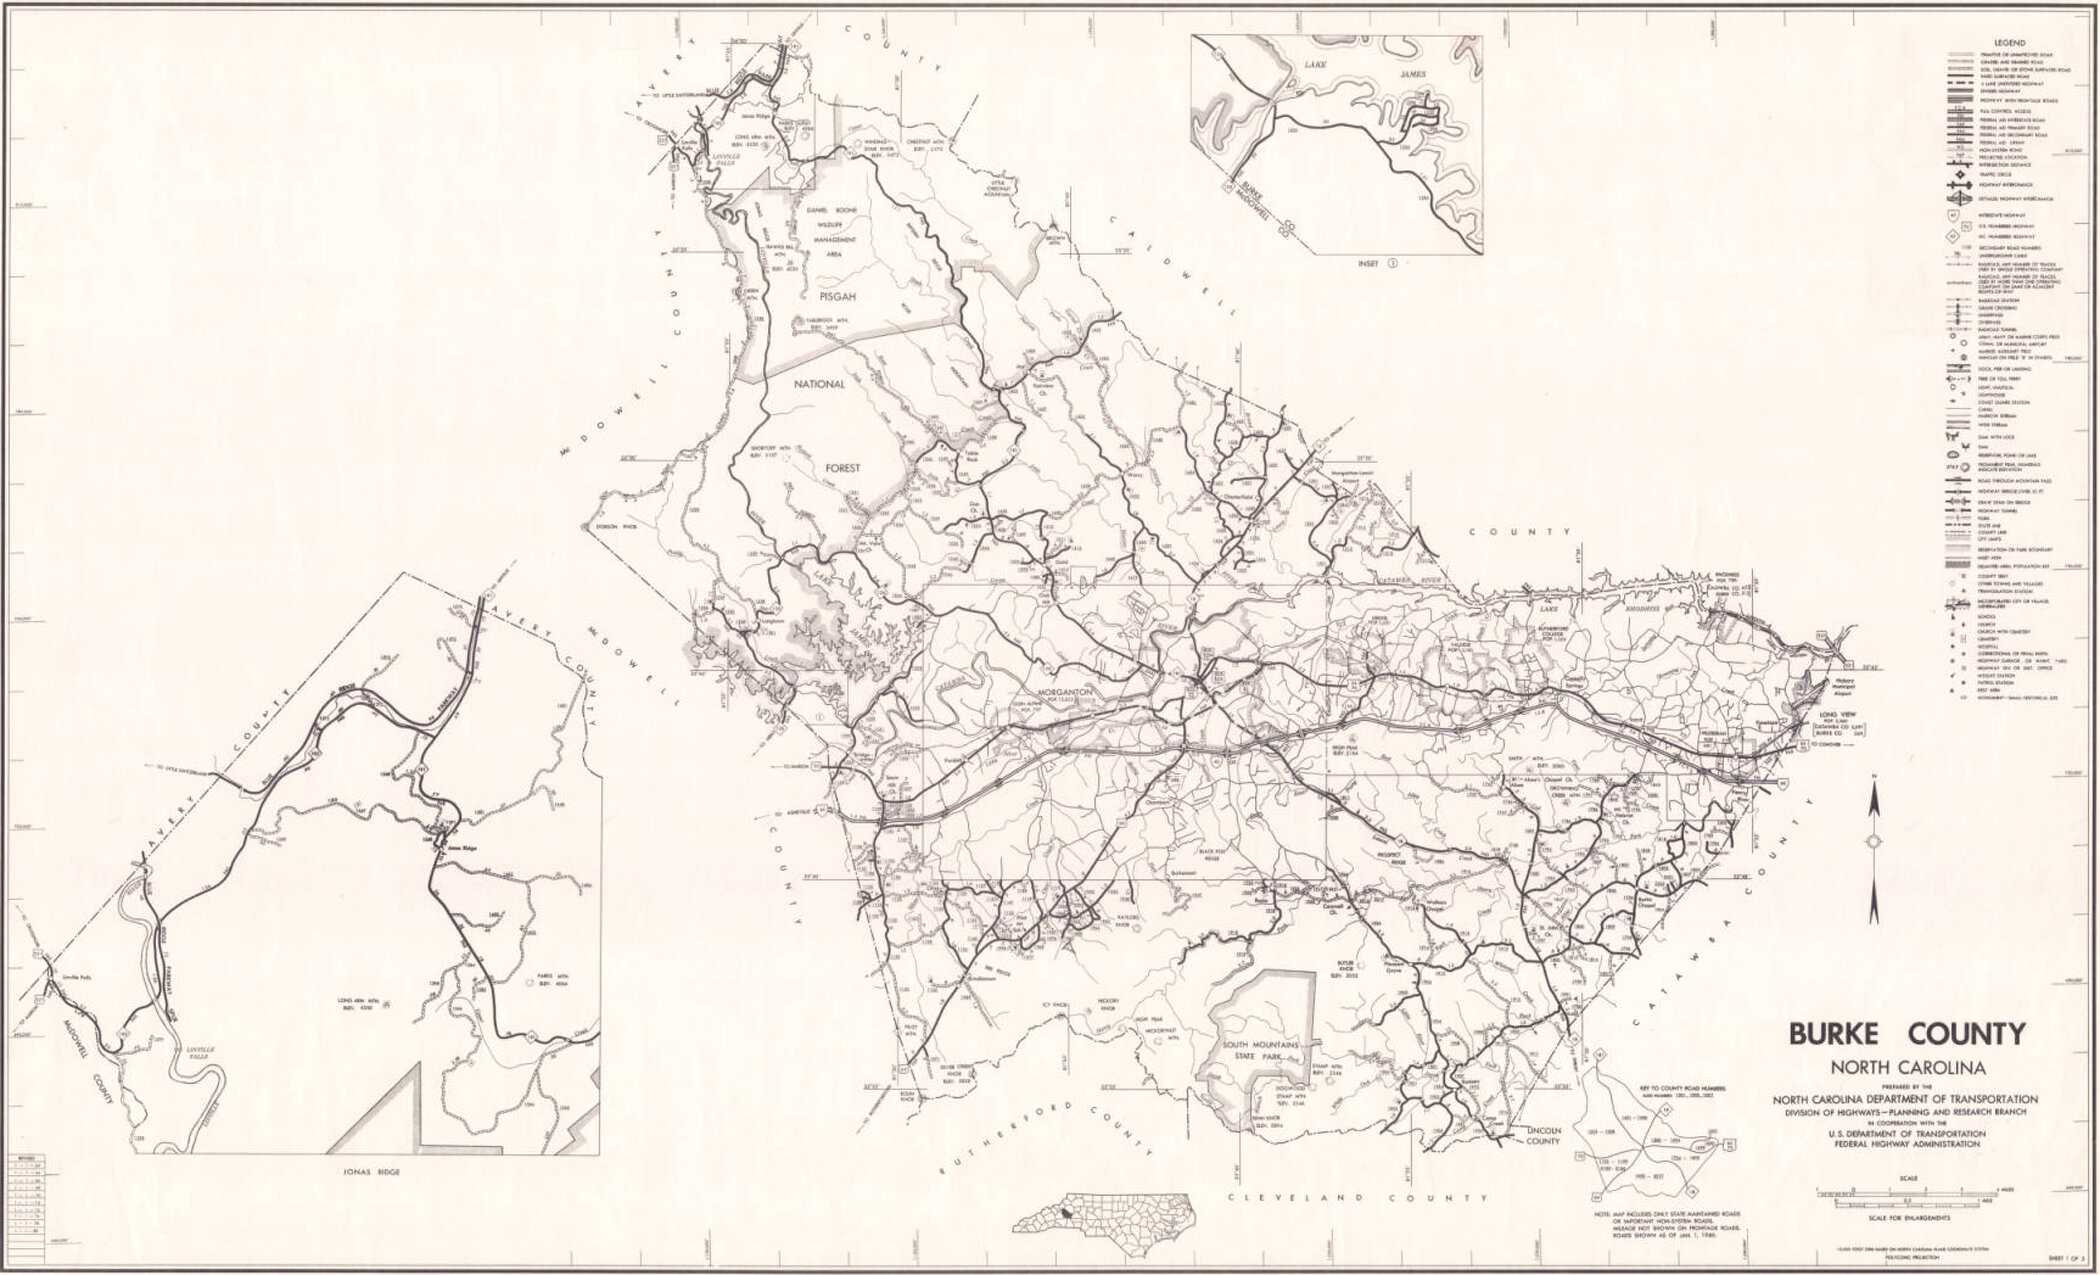 Burke_County_Road_Map_1980.jpg